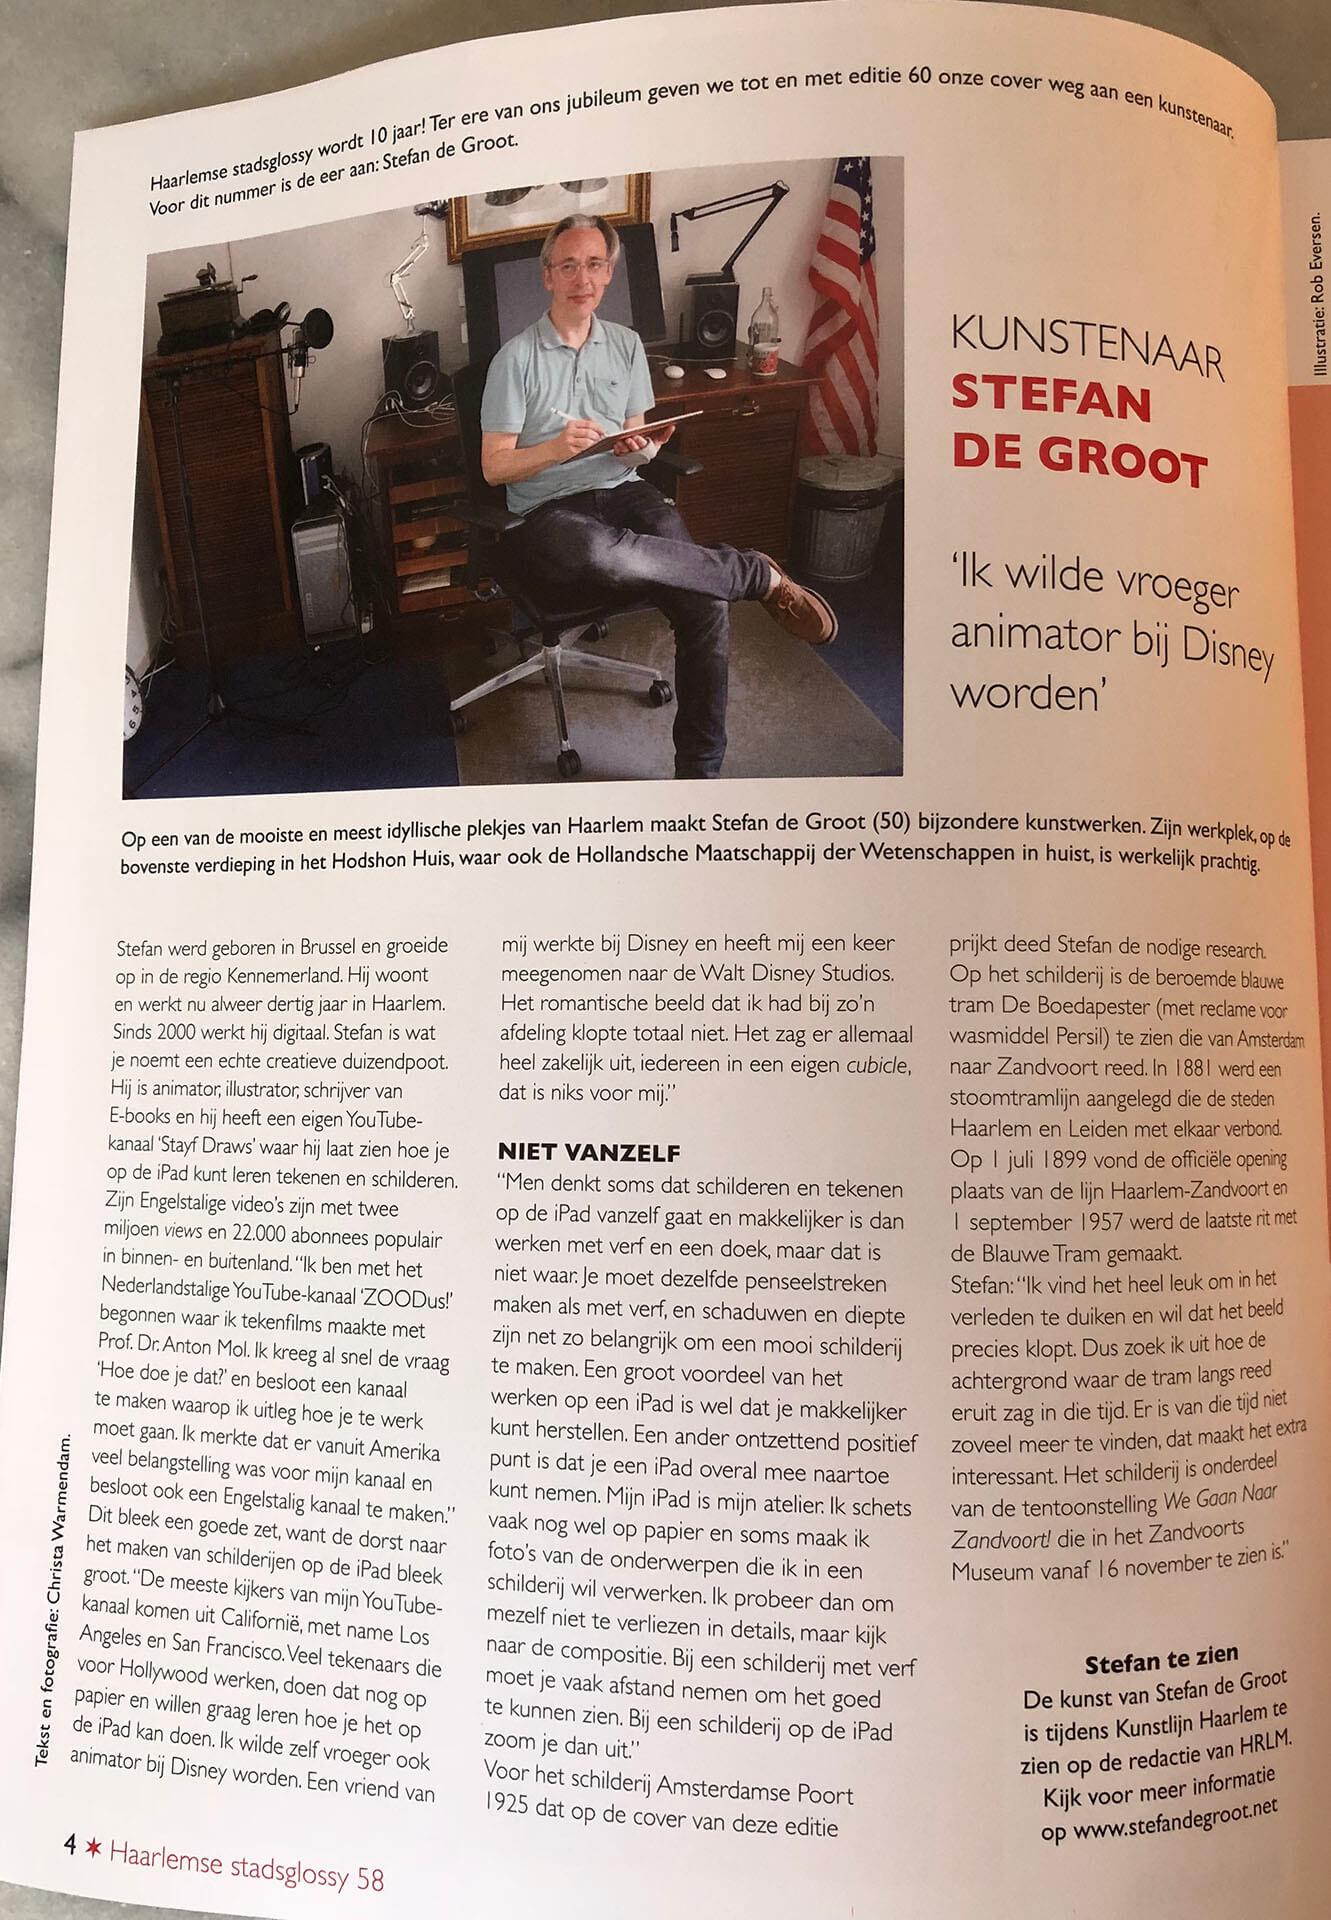 Haarlemse Stadsglossy interview Stefan de Groot